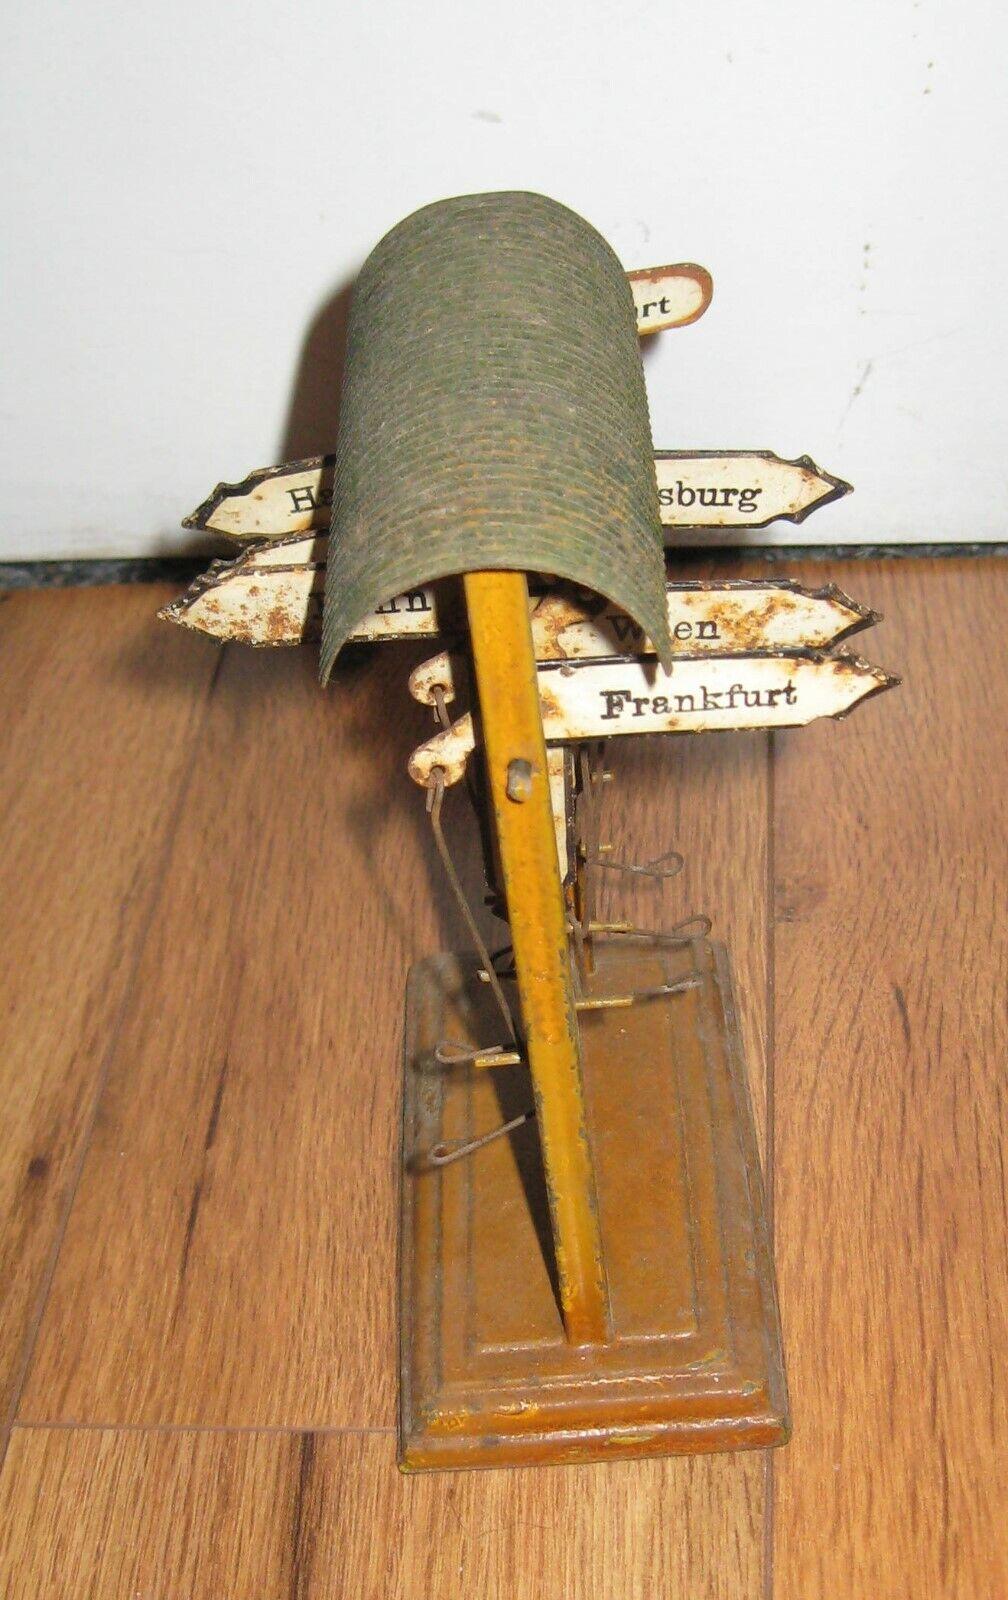 Prewar German Marklin Train Destination Sign Cities Prewar Antique Tin Rare Bing